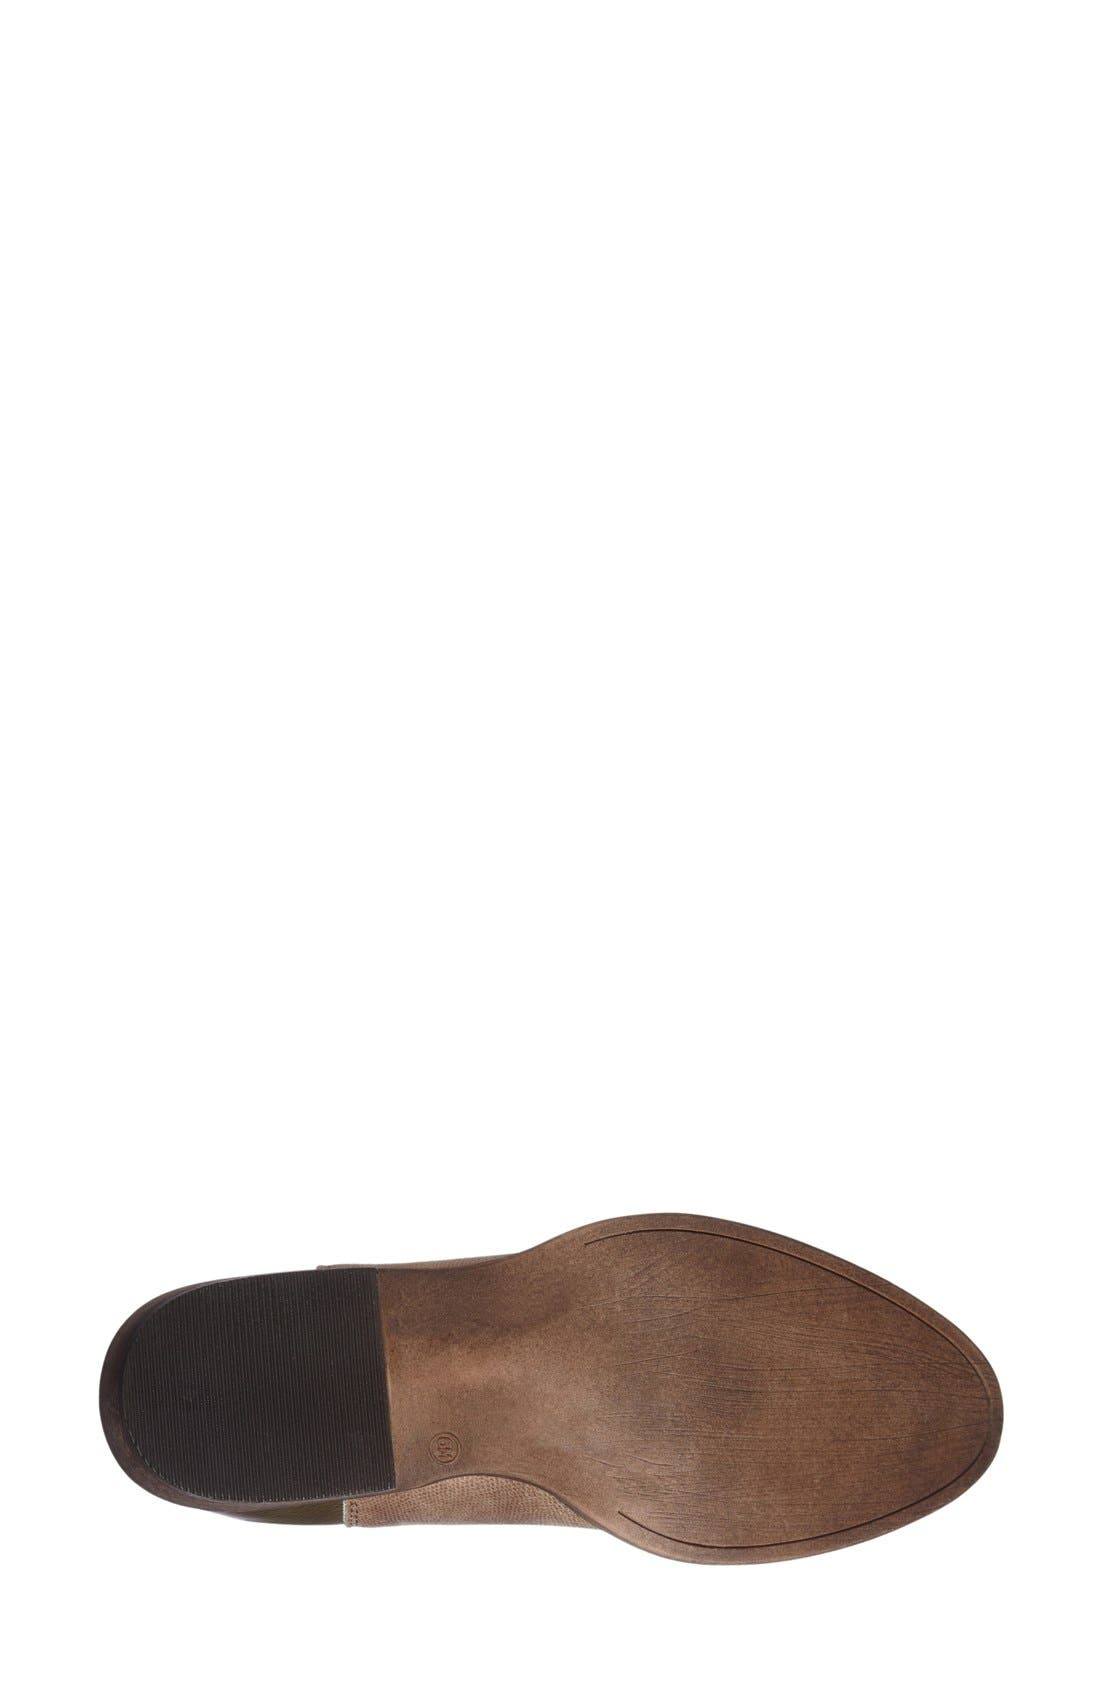 Alternate Image 4  - Coconuts by Matisse 'Blackjack' Ankle Boot (Women)